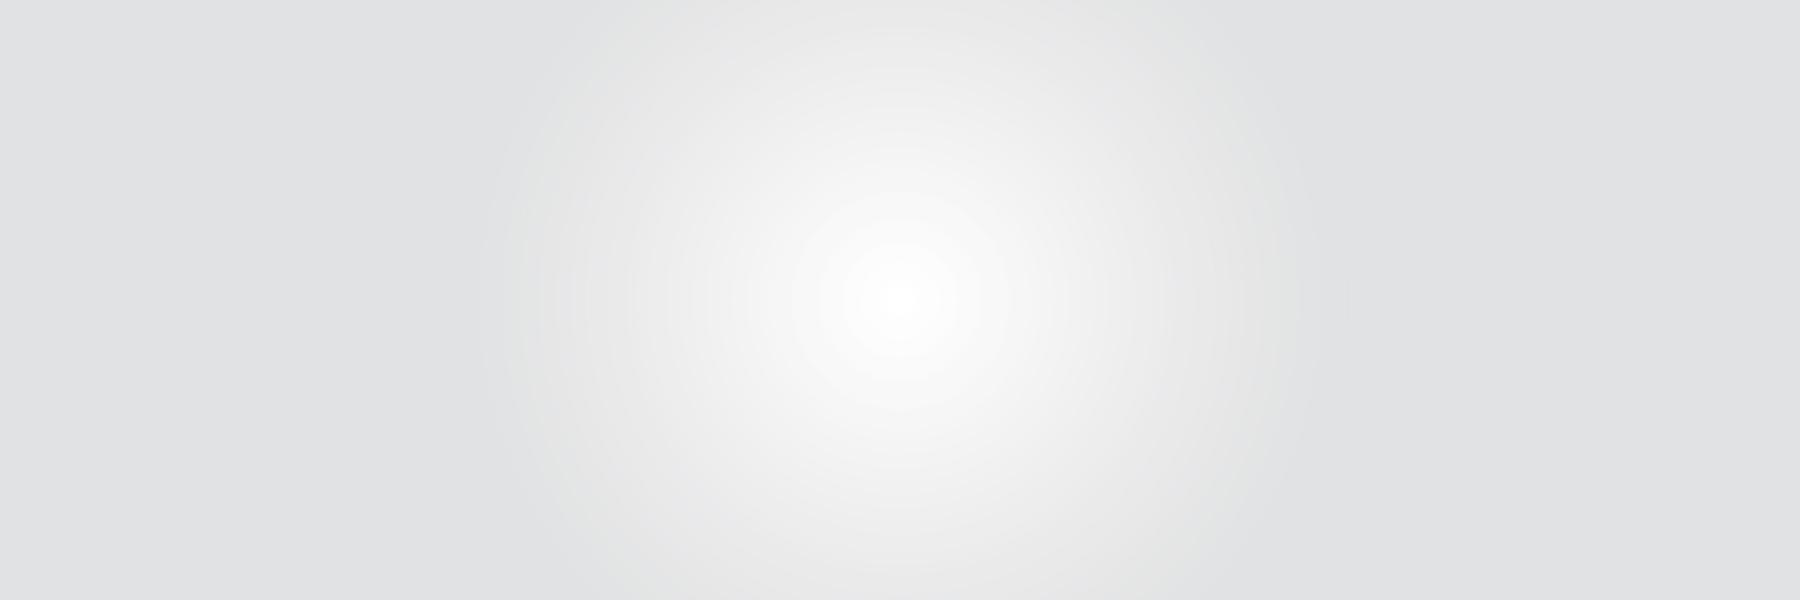 fond_ban_scvg_halo_blanc